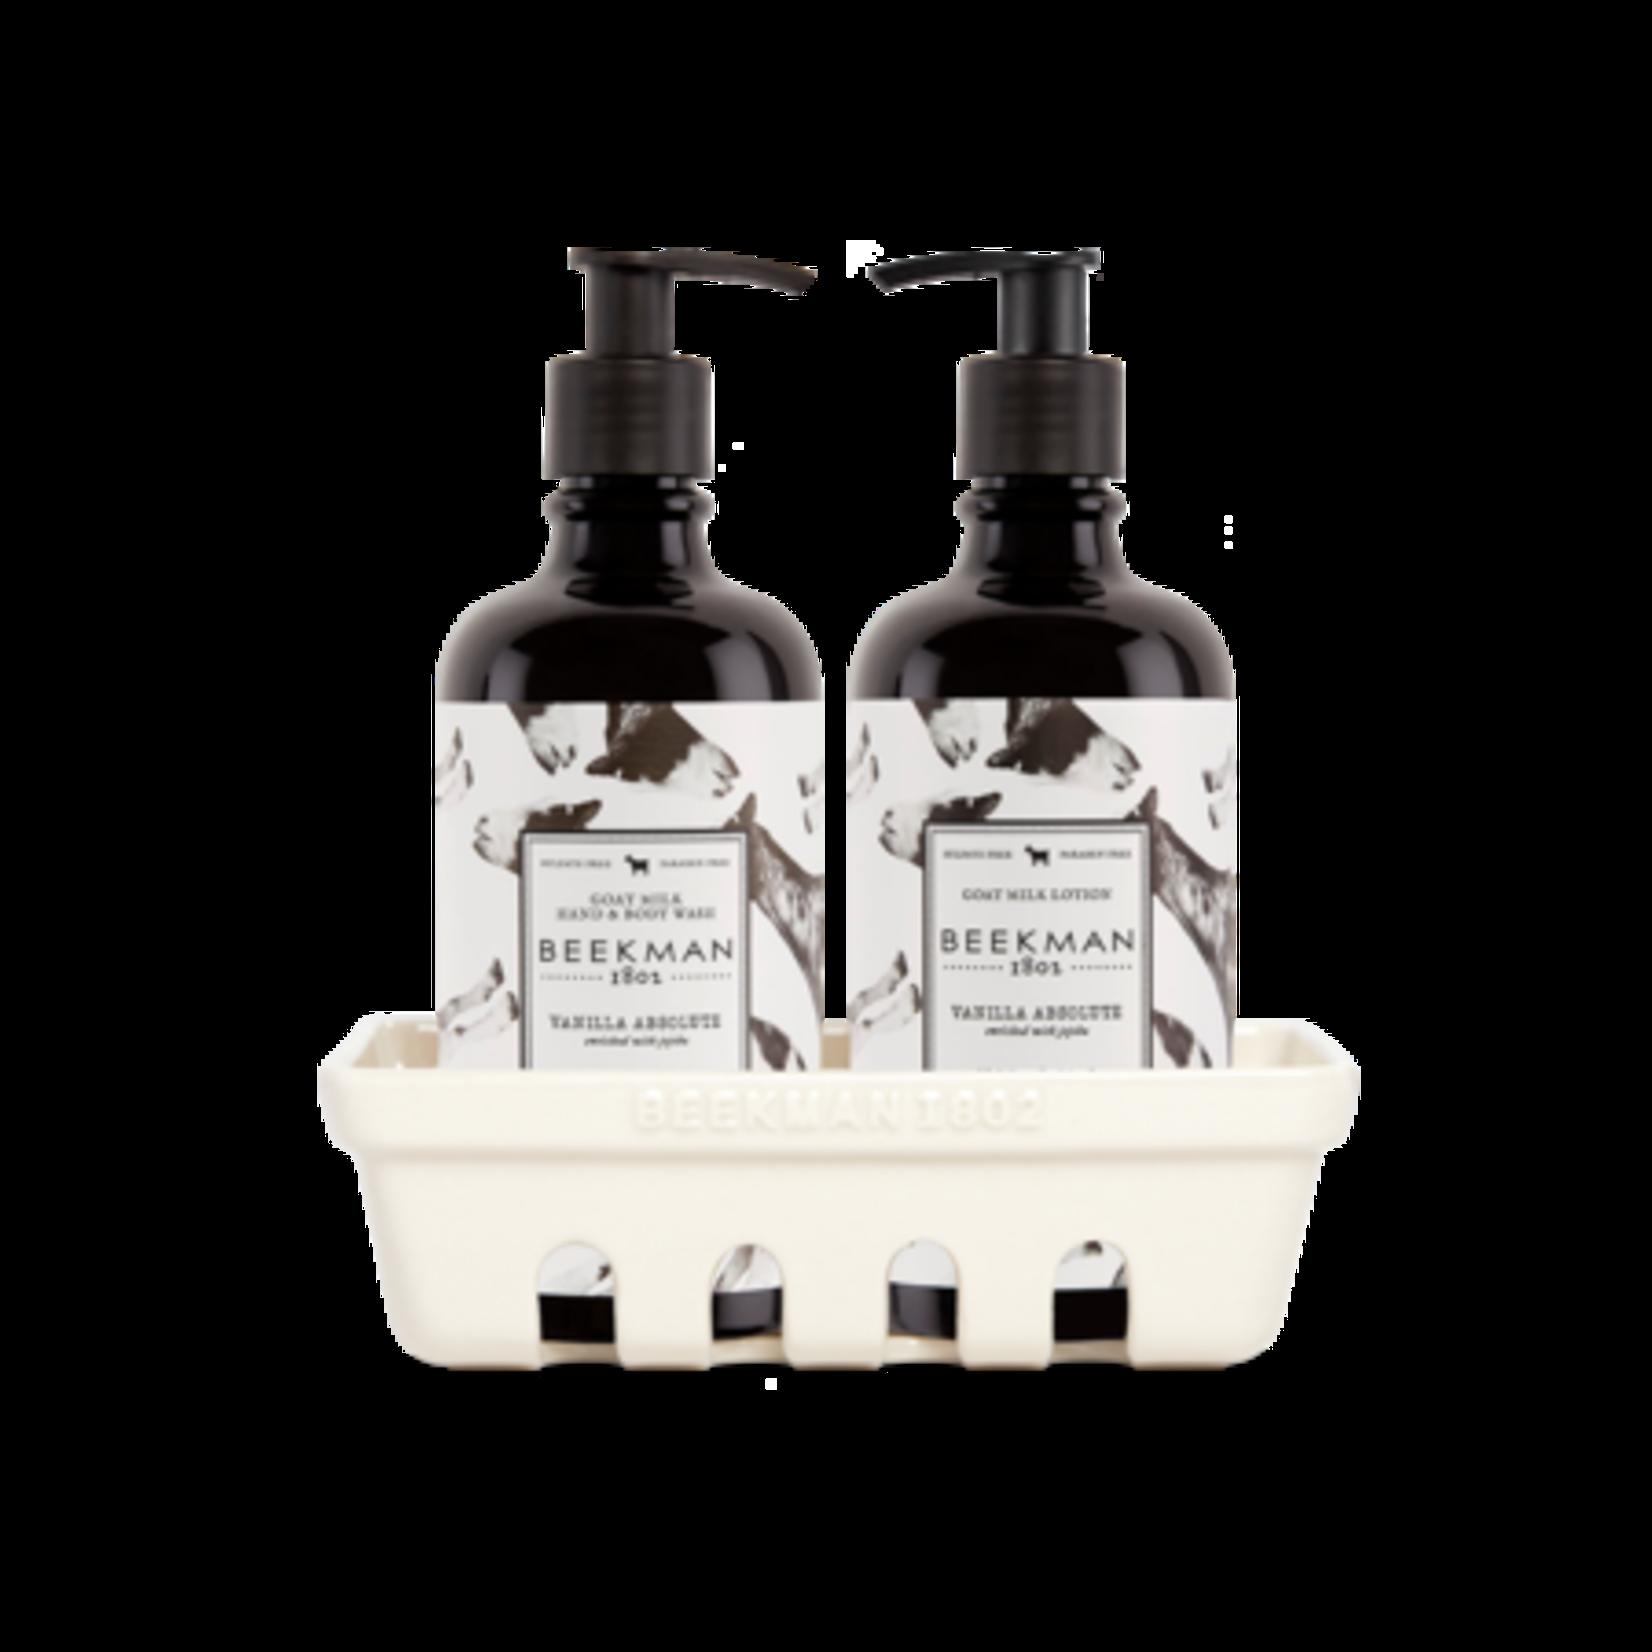 BEEKMAN 1802 Vanilla Absolute Hand Care Caddy